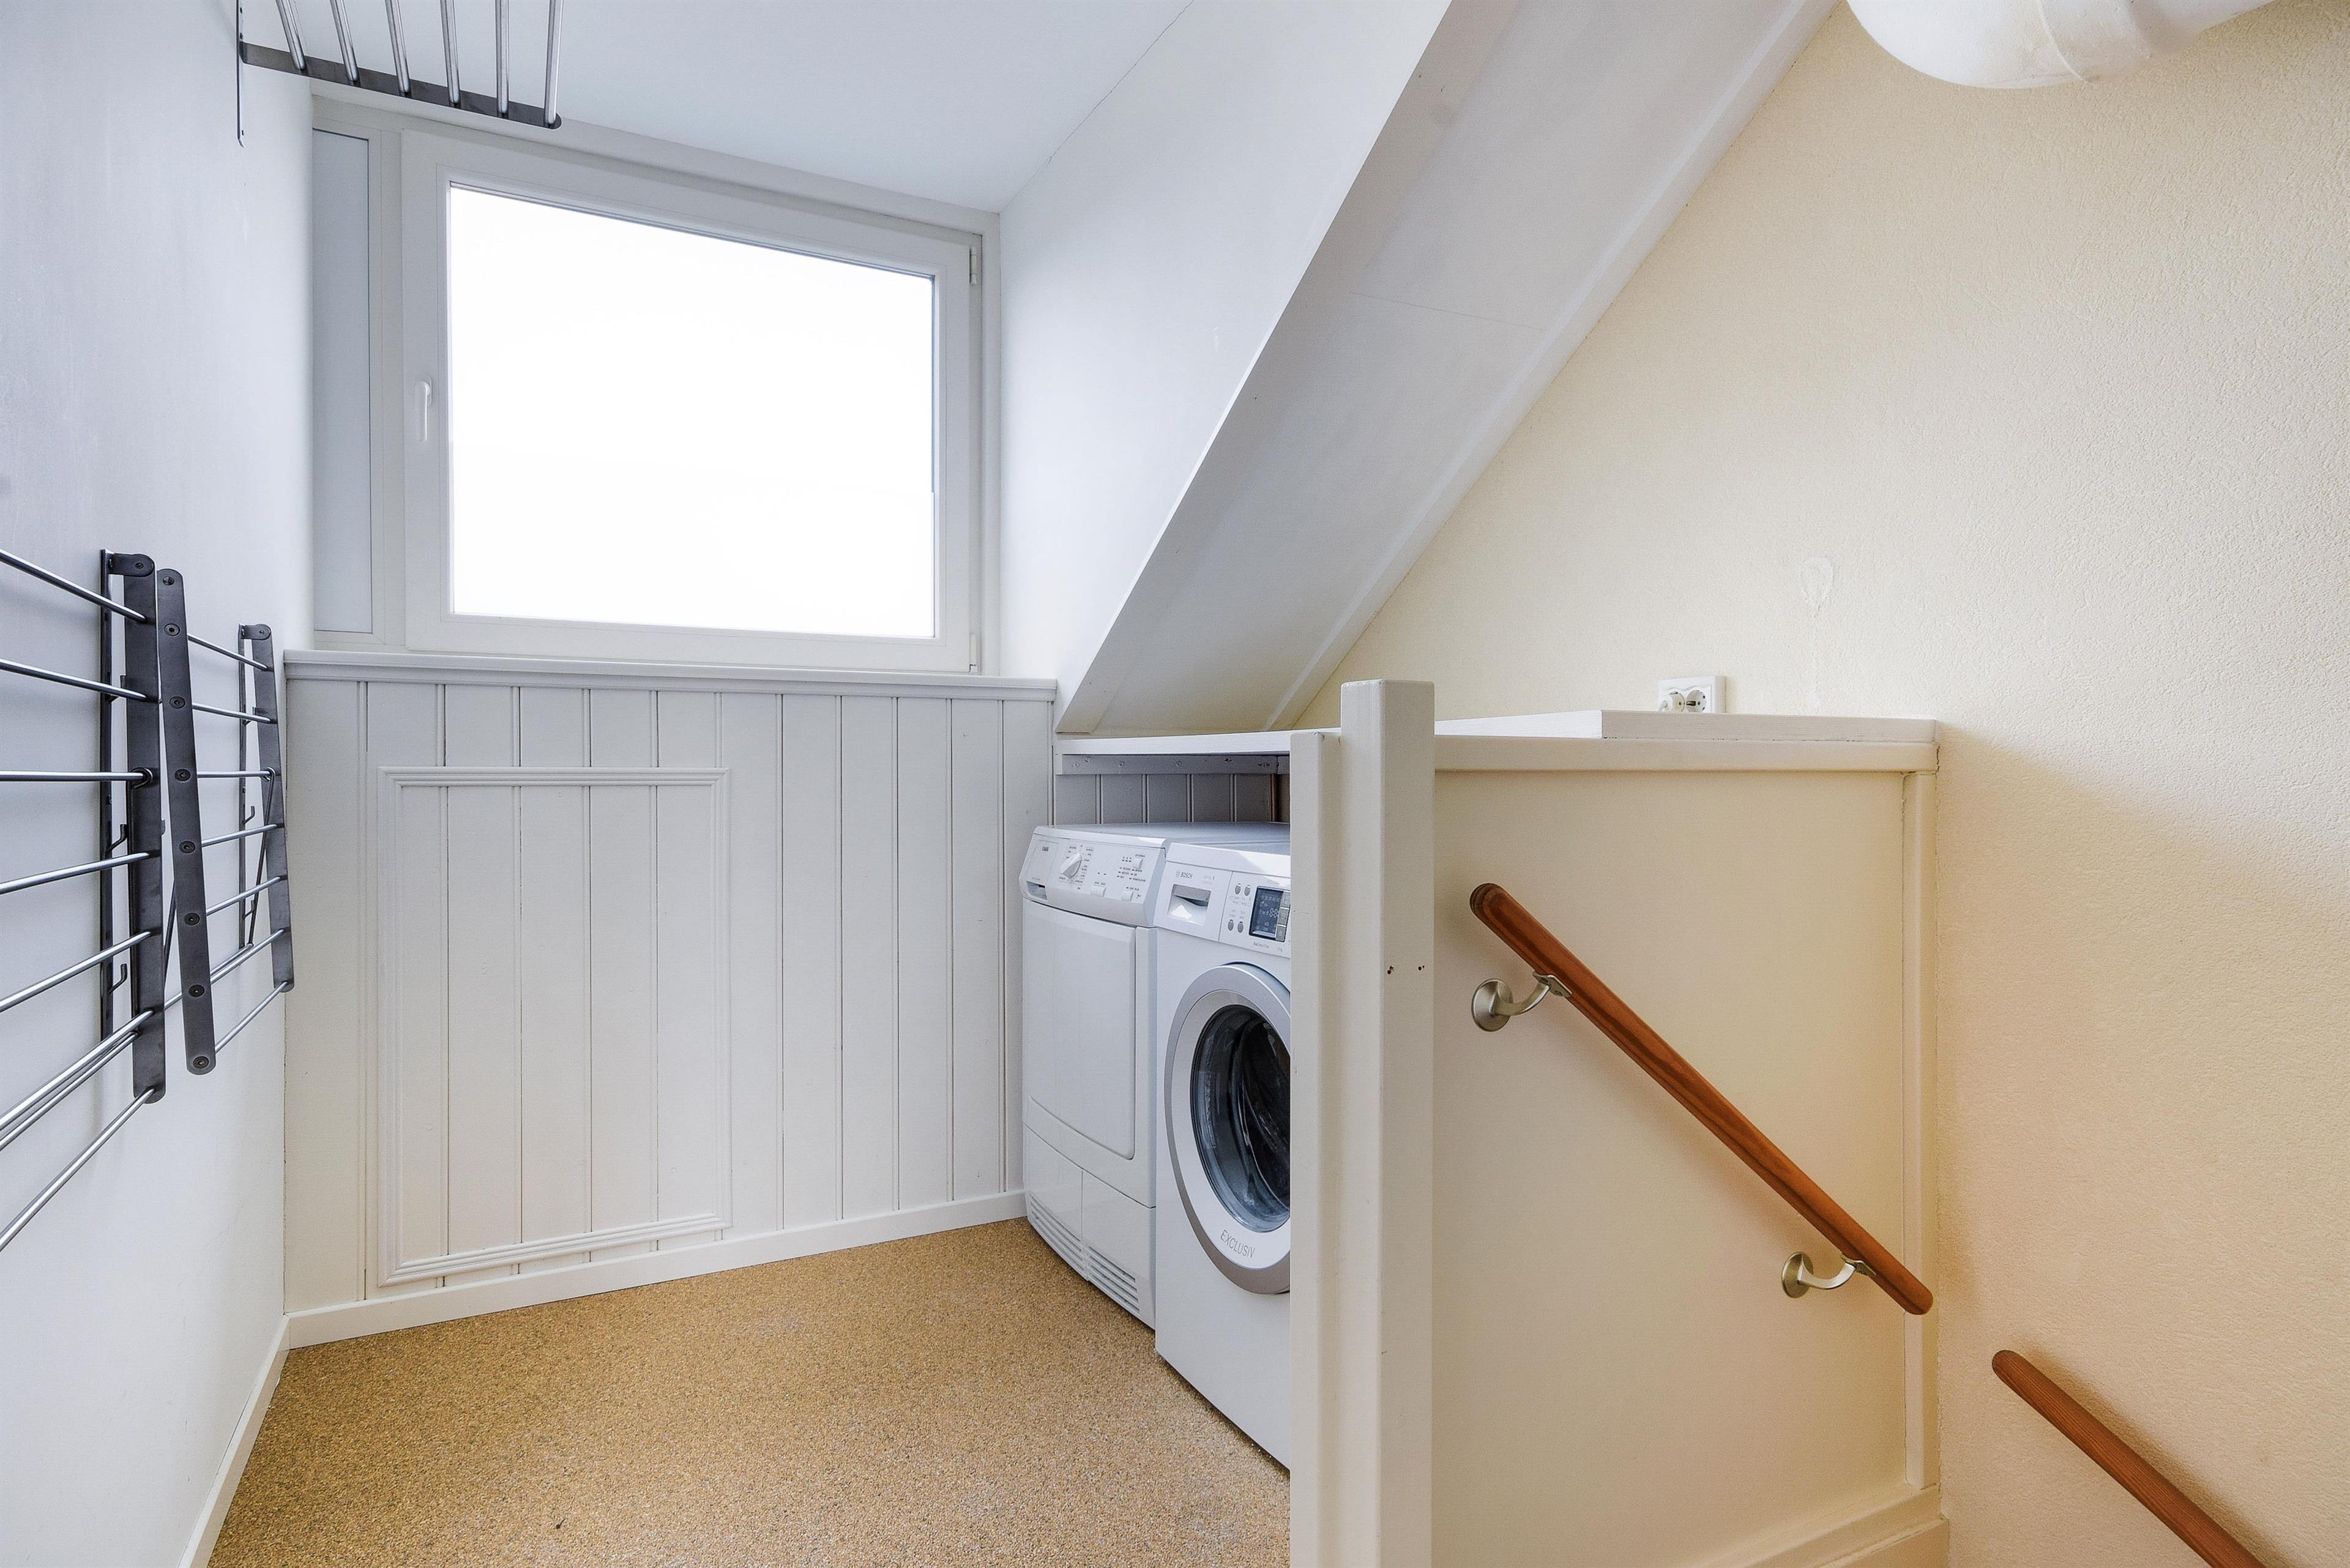 Leuk idee om op zolder je wasmachine en droger netjes weg te